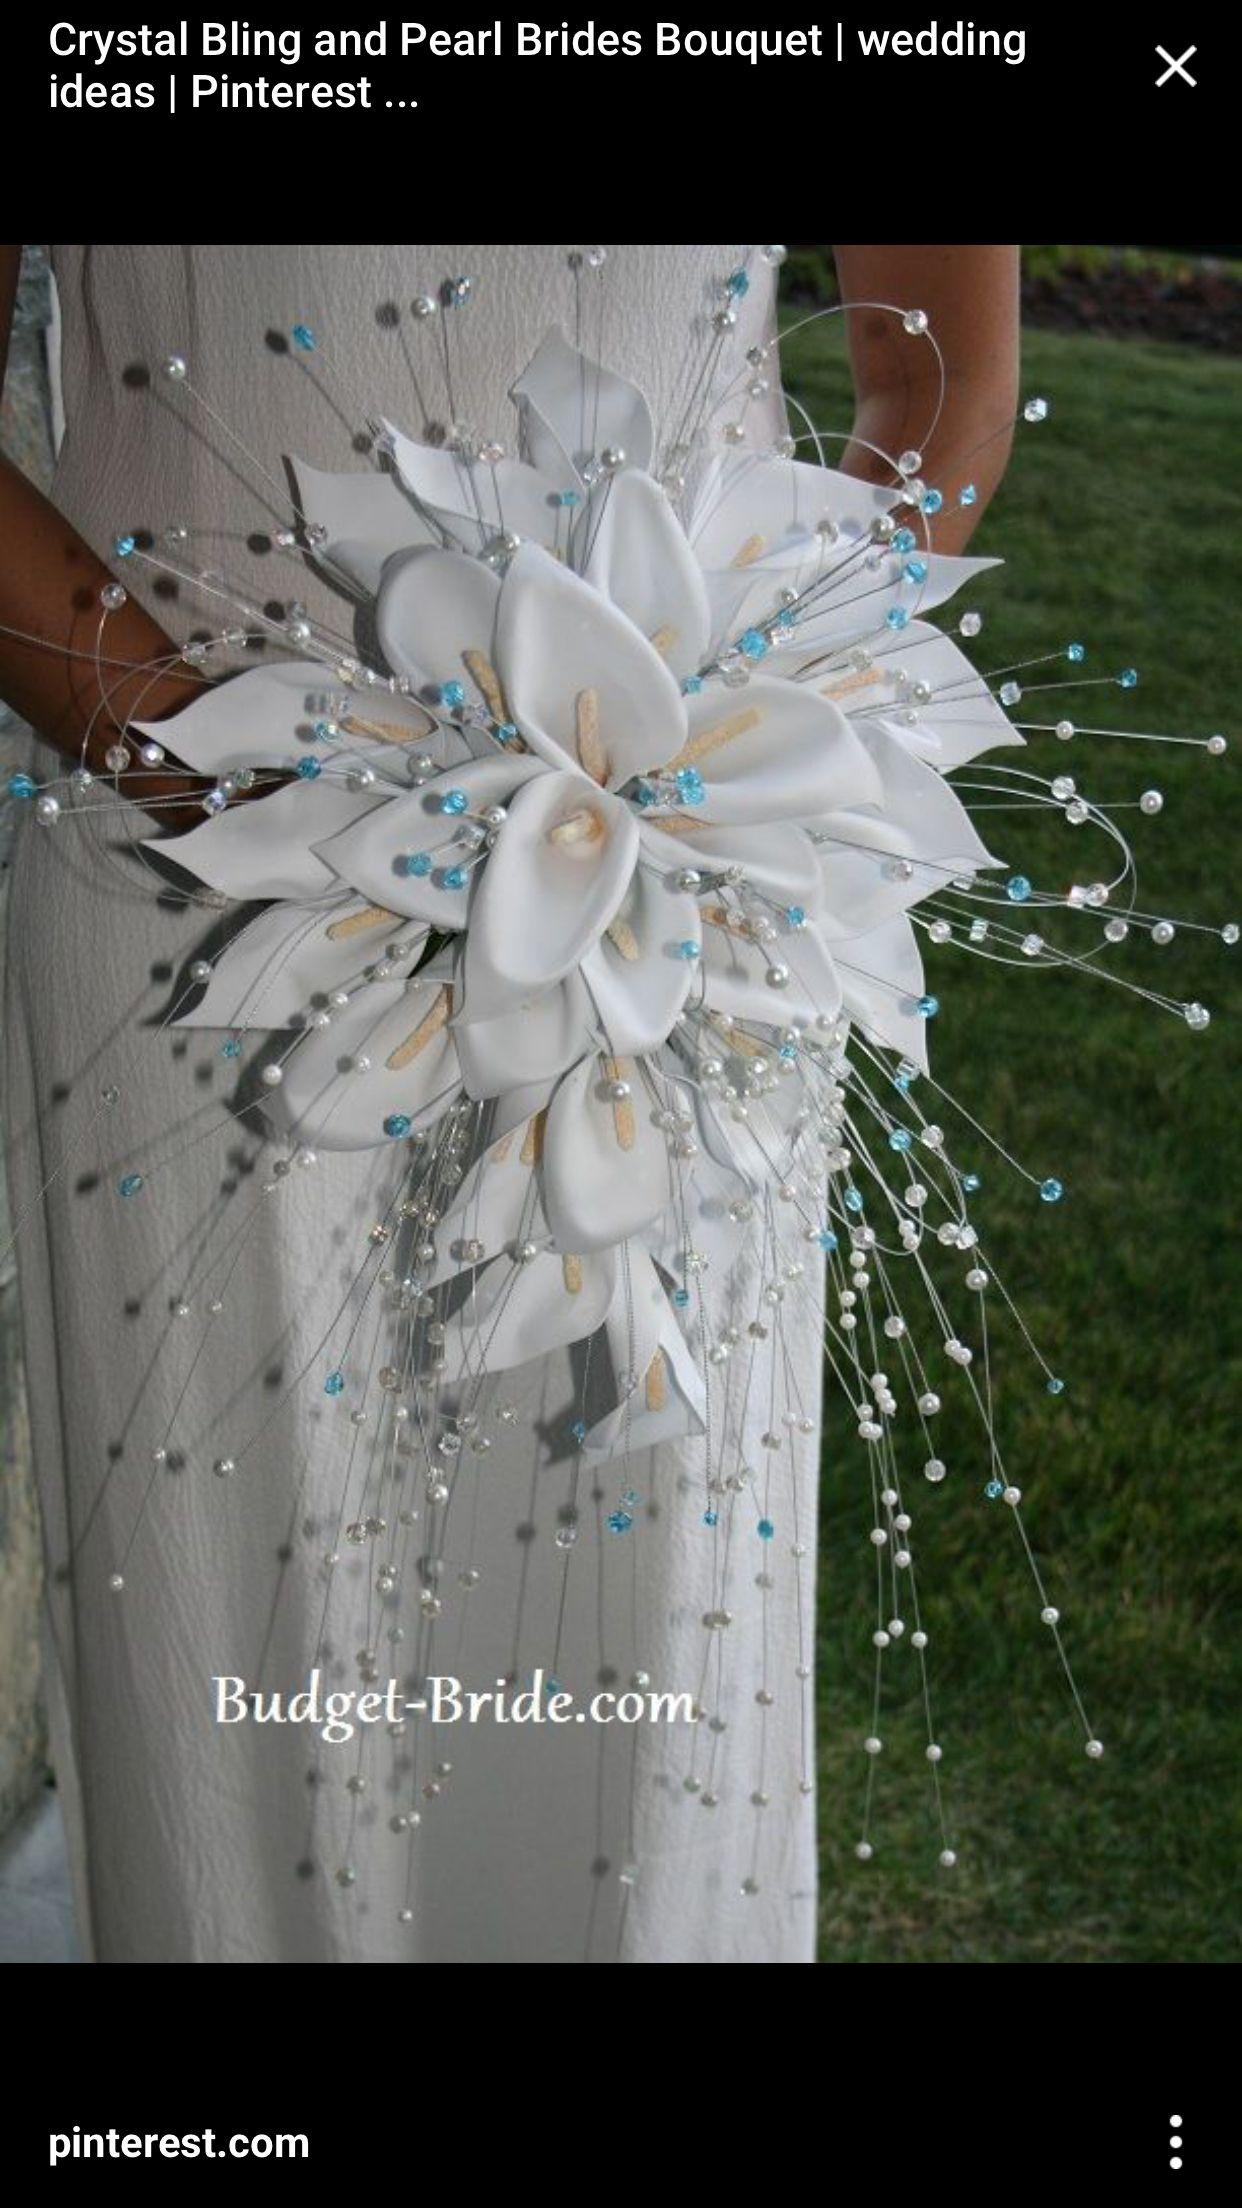 Pin By Afra Geurs On Wedding Stuff Ideas Wedding Flower Guide Flower Bouquet Wedding Artificial Flowers Wedding